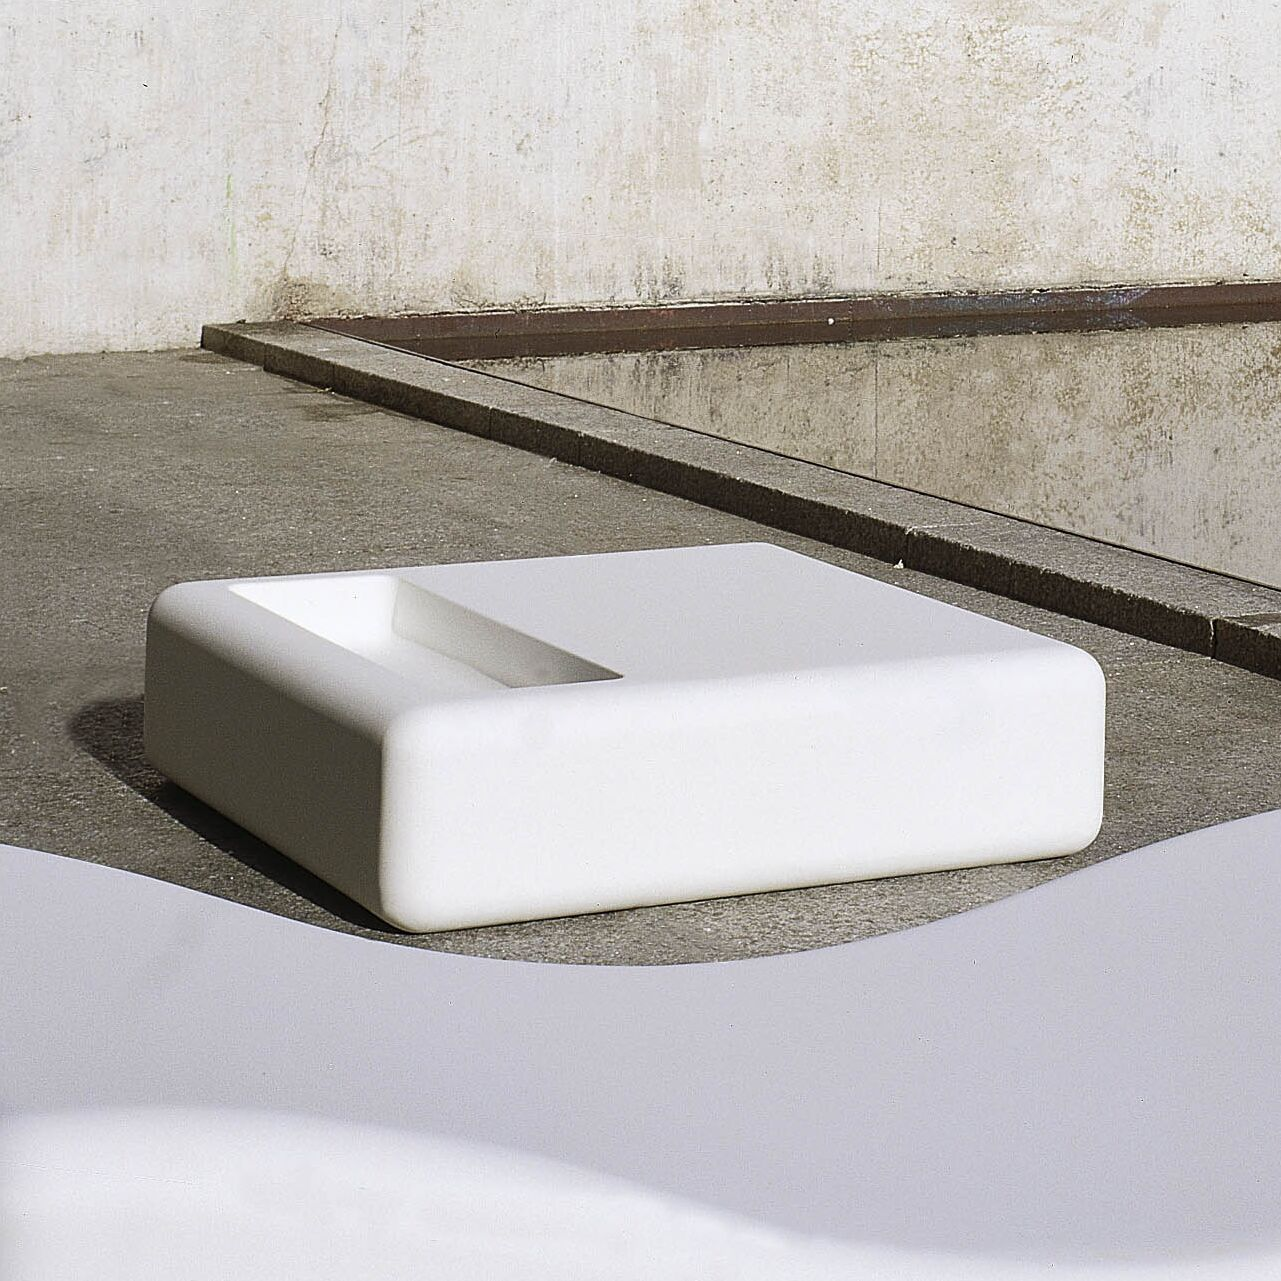 356 Plastic Side Table Finish: White